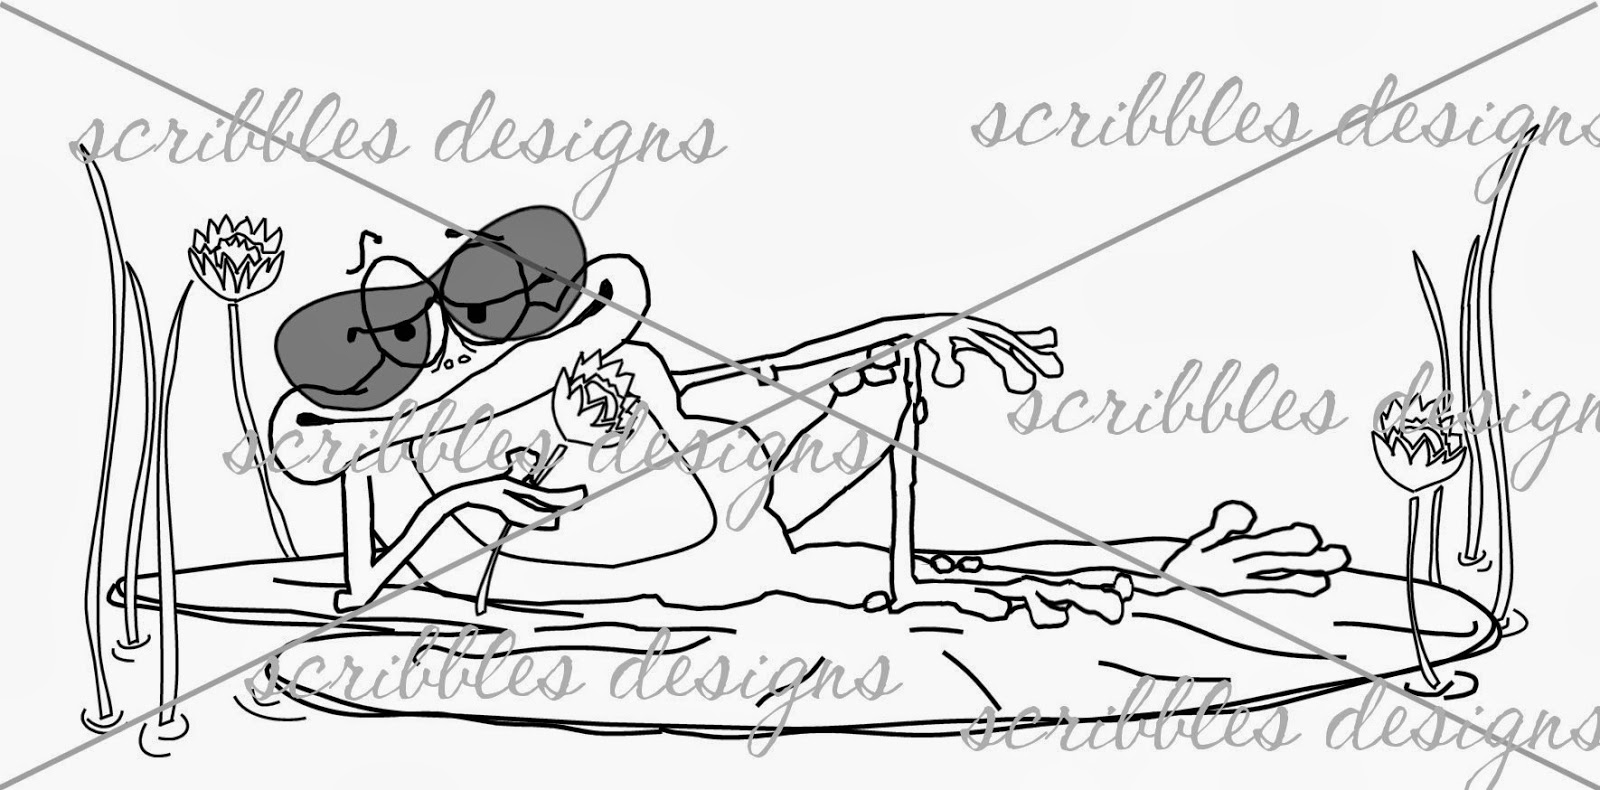 http://buyscribblesdesigns.blogspot.ca/2014/03/321-carls-pad-400.html